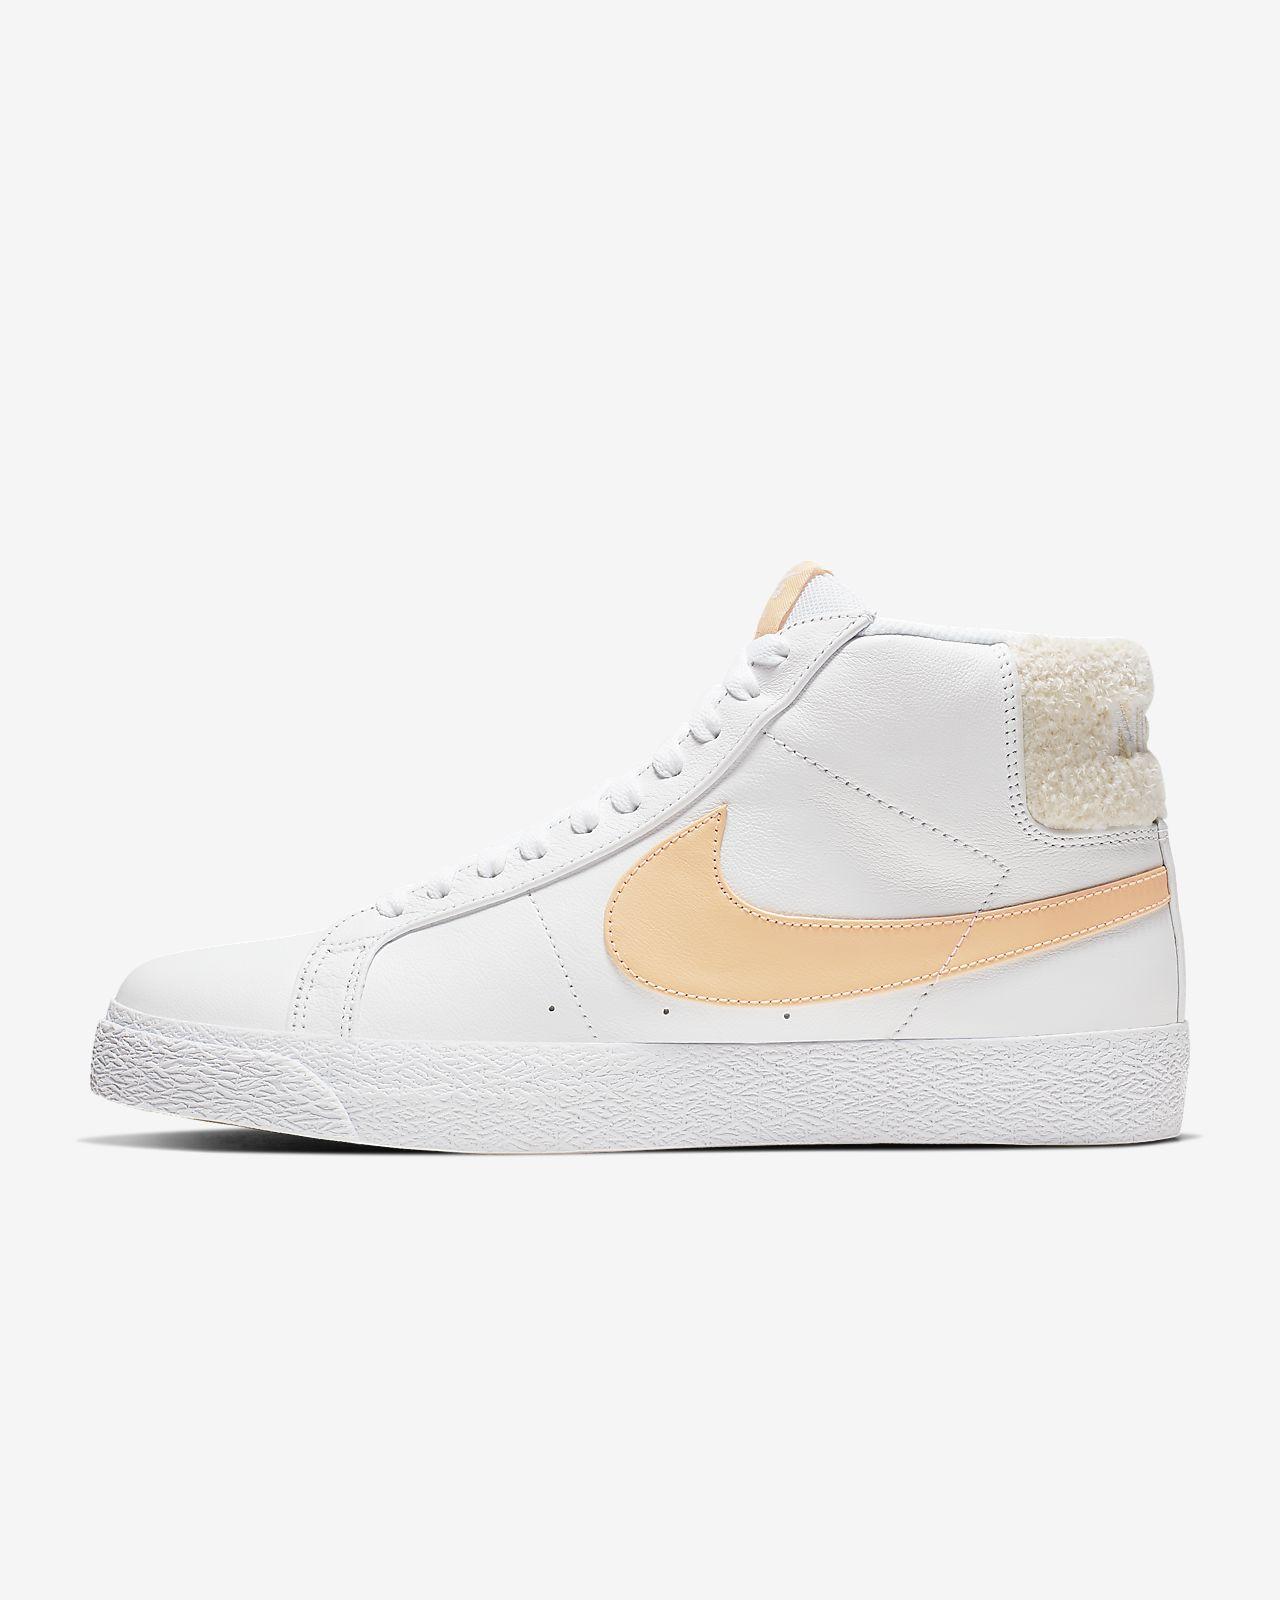 Nike SB Zoom Blazer Mid Premium Zapatillas de skateboard